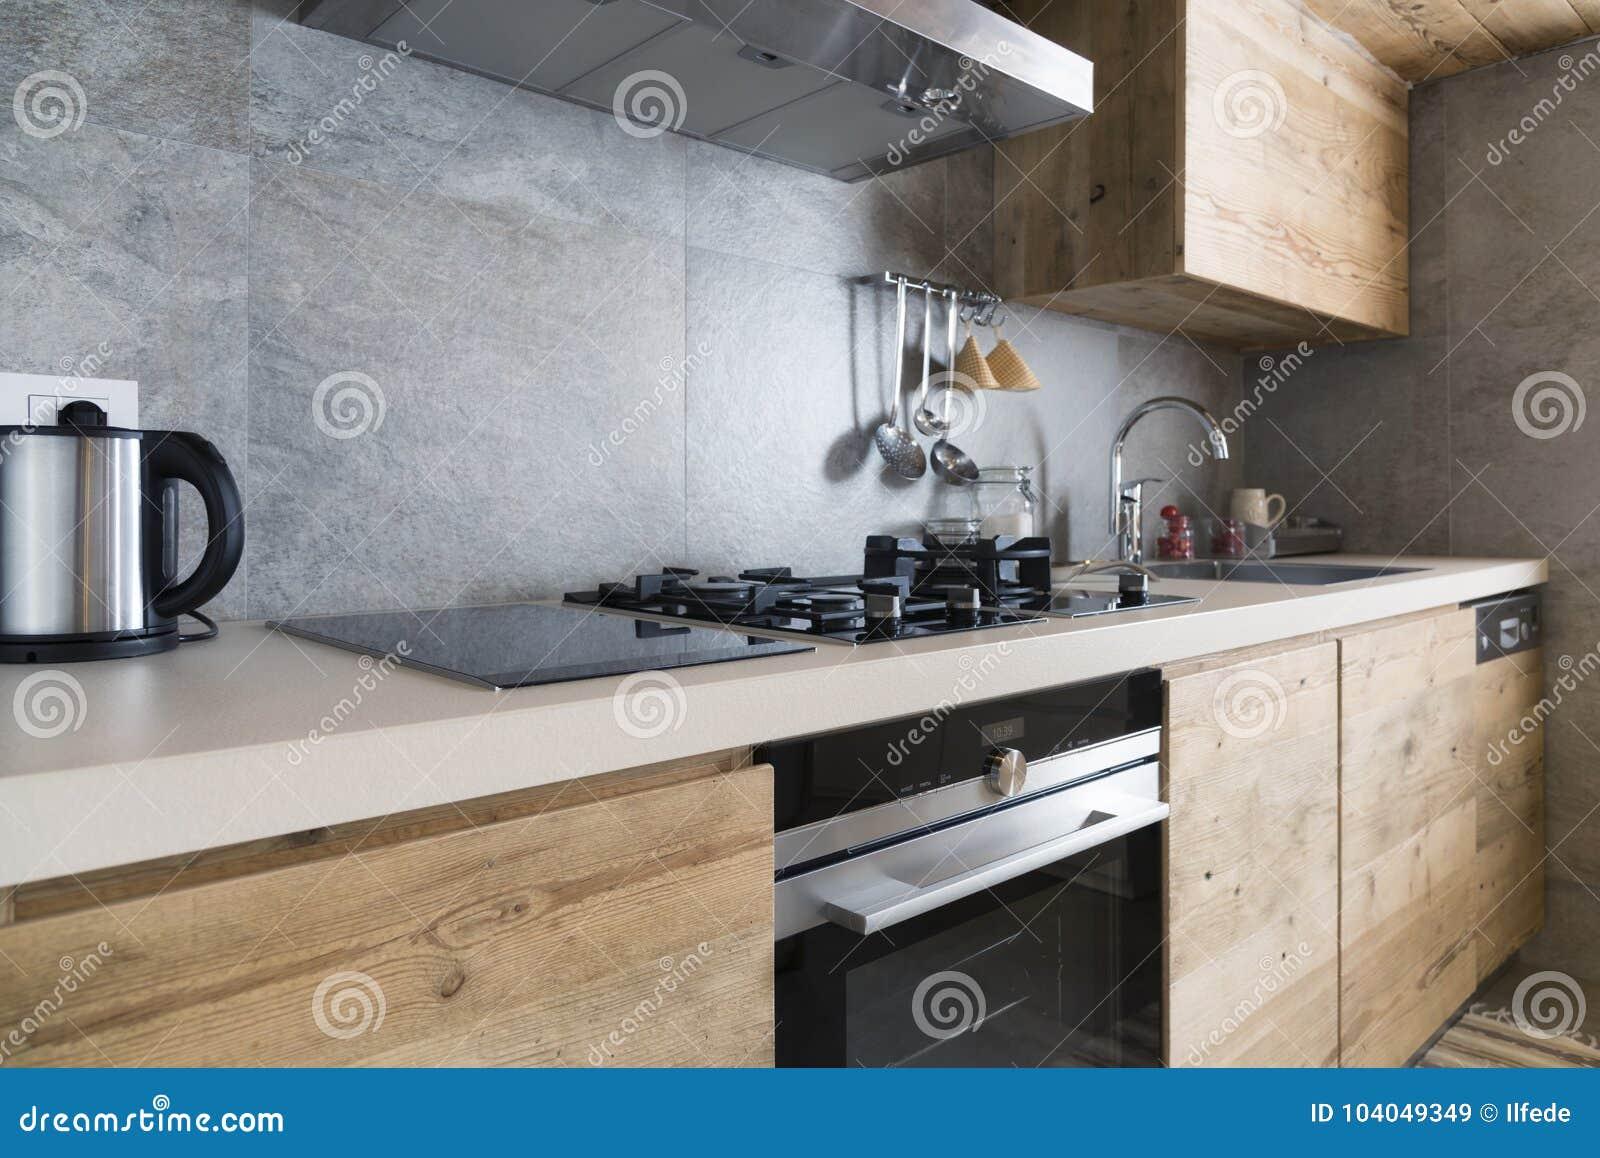 Contatore Di Cucina Di Legno Moderno Immagine Stock - Immagine di ...